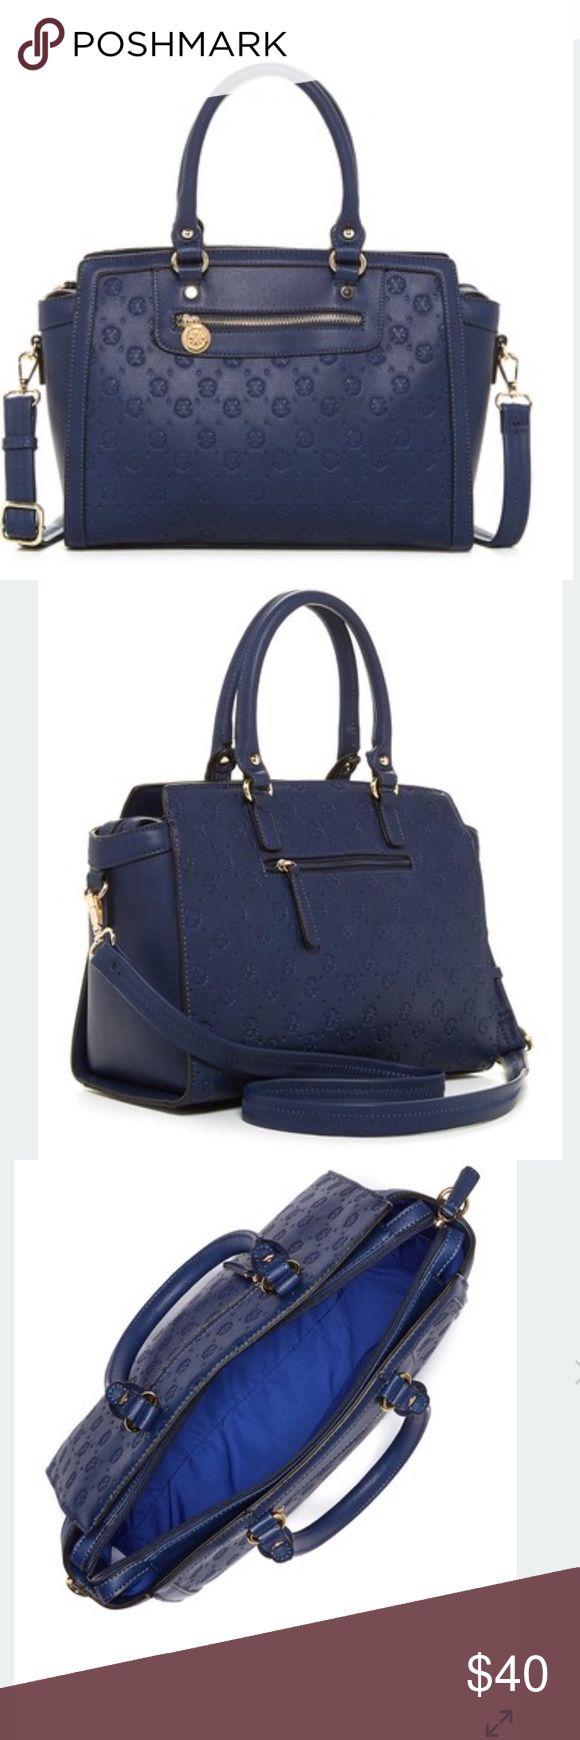 NWT Christian Lacroix CLX Trocadero Handbag NWT CLX Christian Lacroix Handbag from Nordstrom Rack 😍 Christian Lacroix Bags Satchels